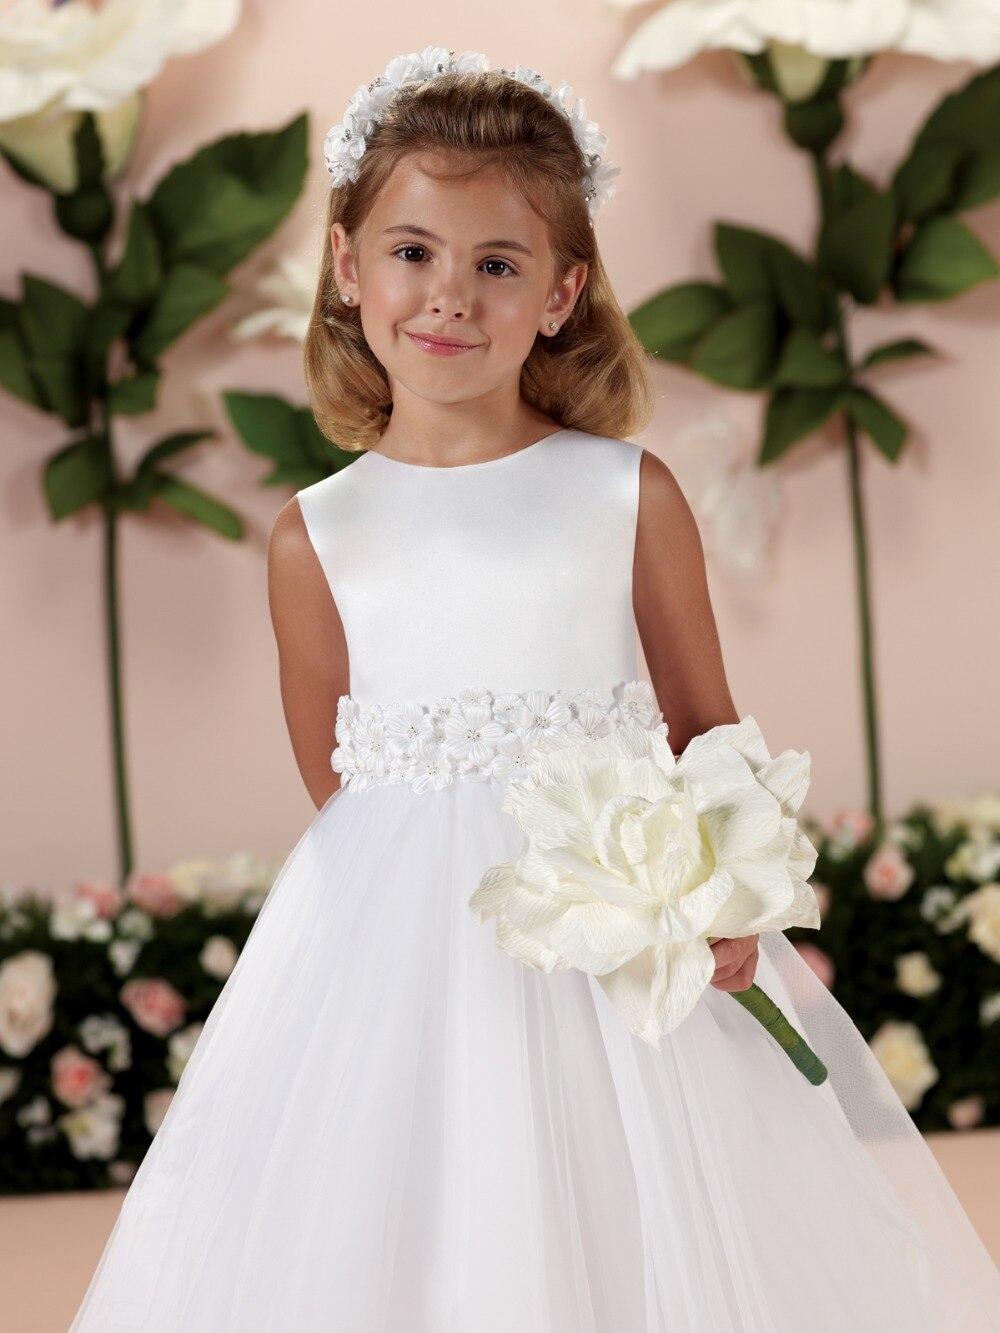 Hot White Organza Flowers Sleeveless Ball Gown Flower Girl Dresses Cheap Tea-Length Communion Dresses vestidos de comunion 2019